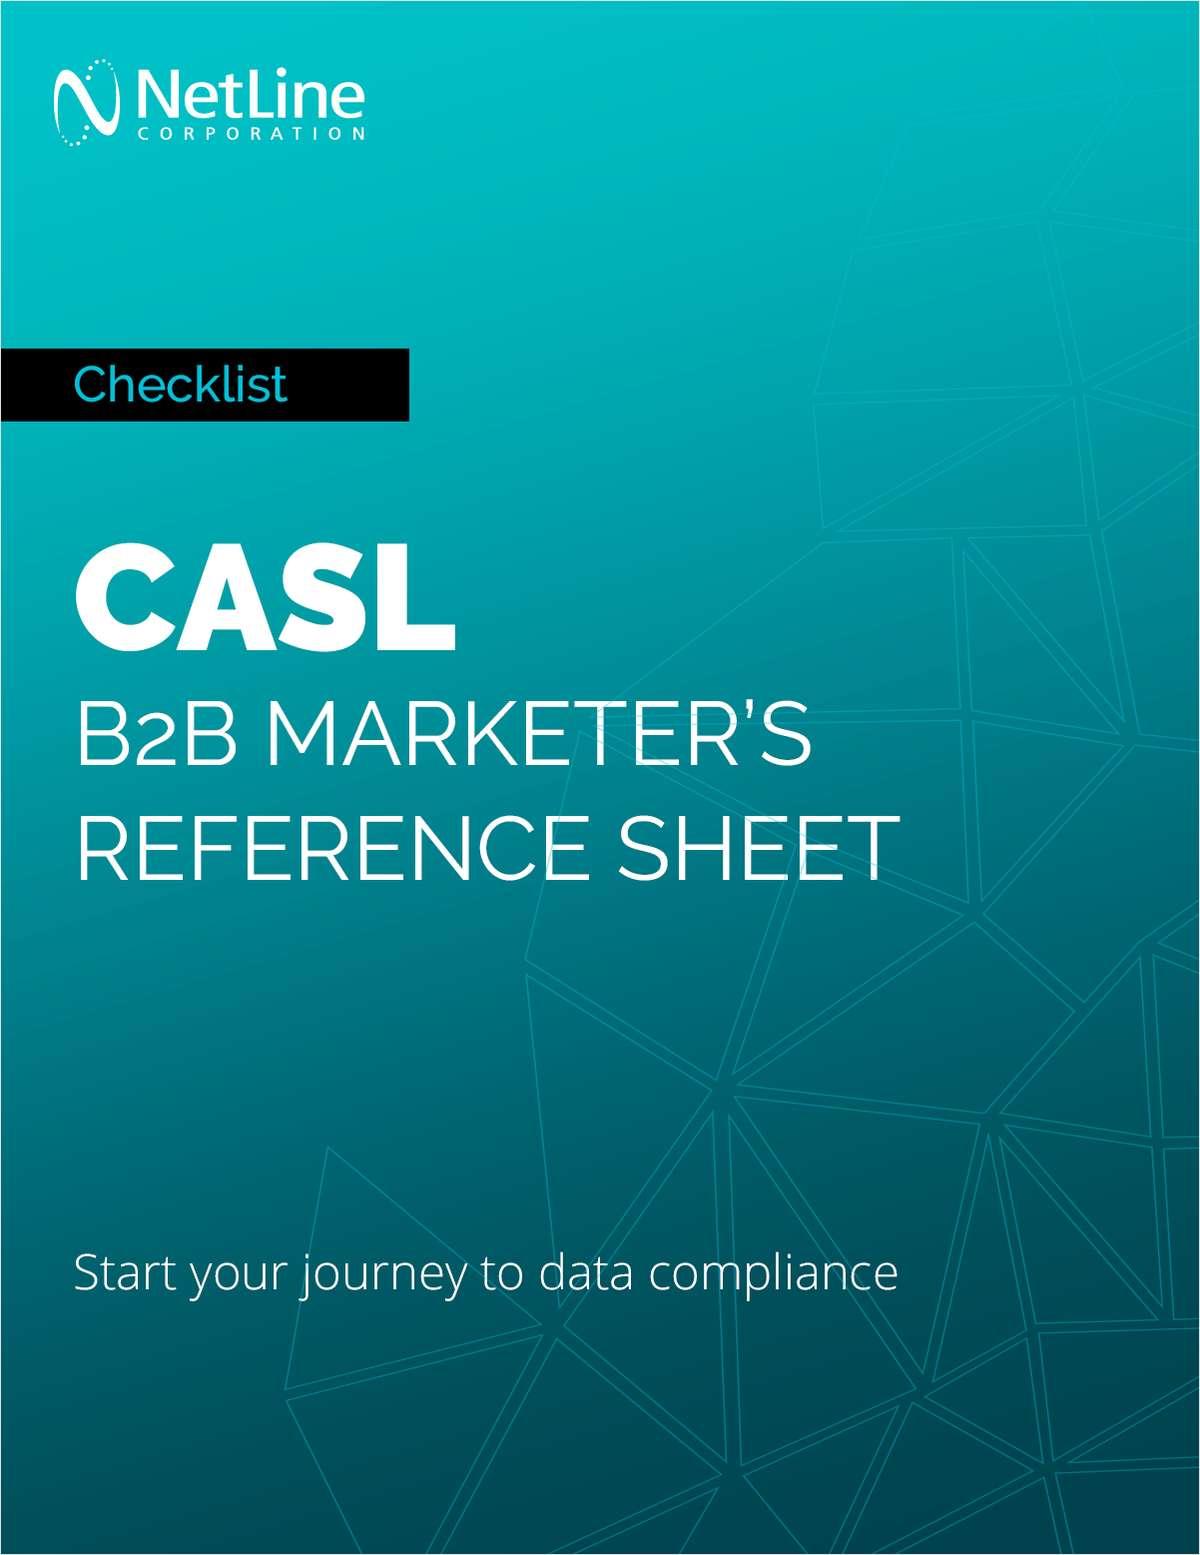 CASL: B2B Marketer's Reference Sheet